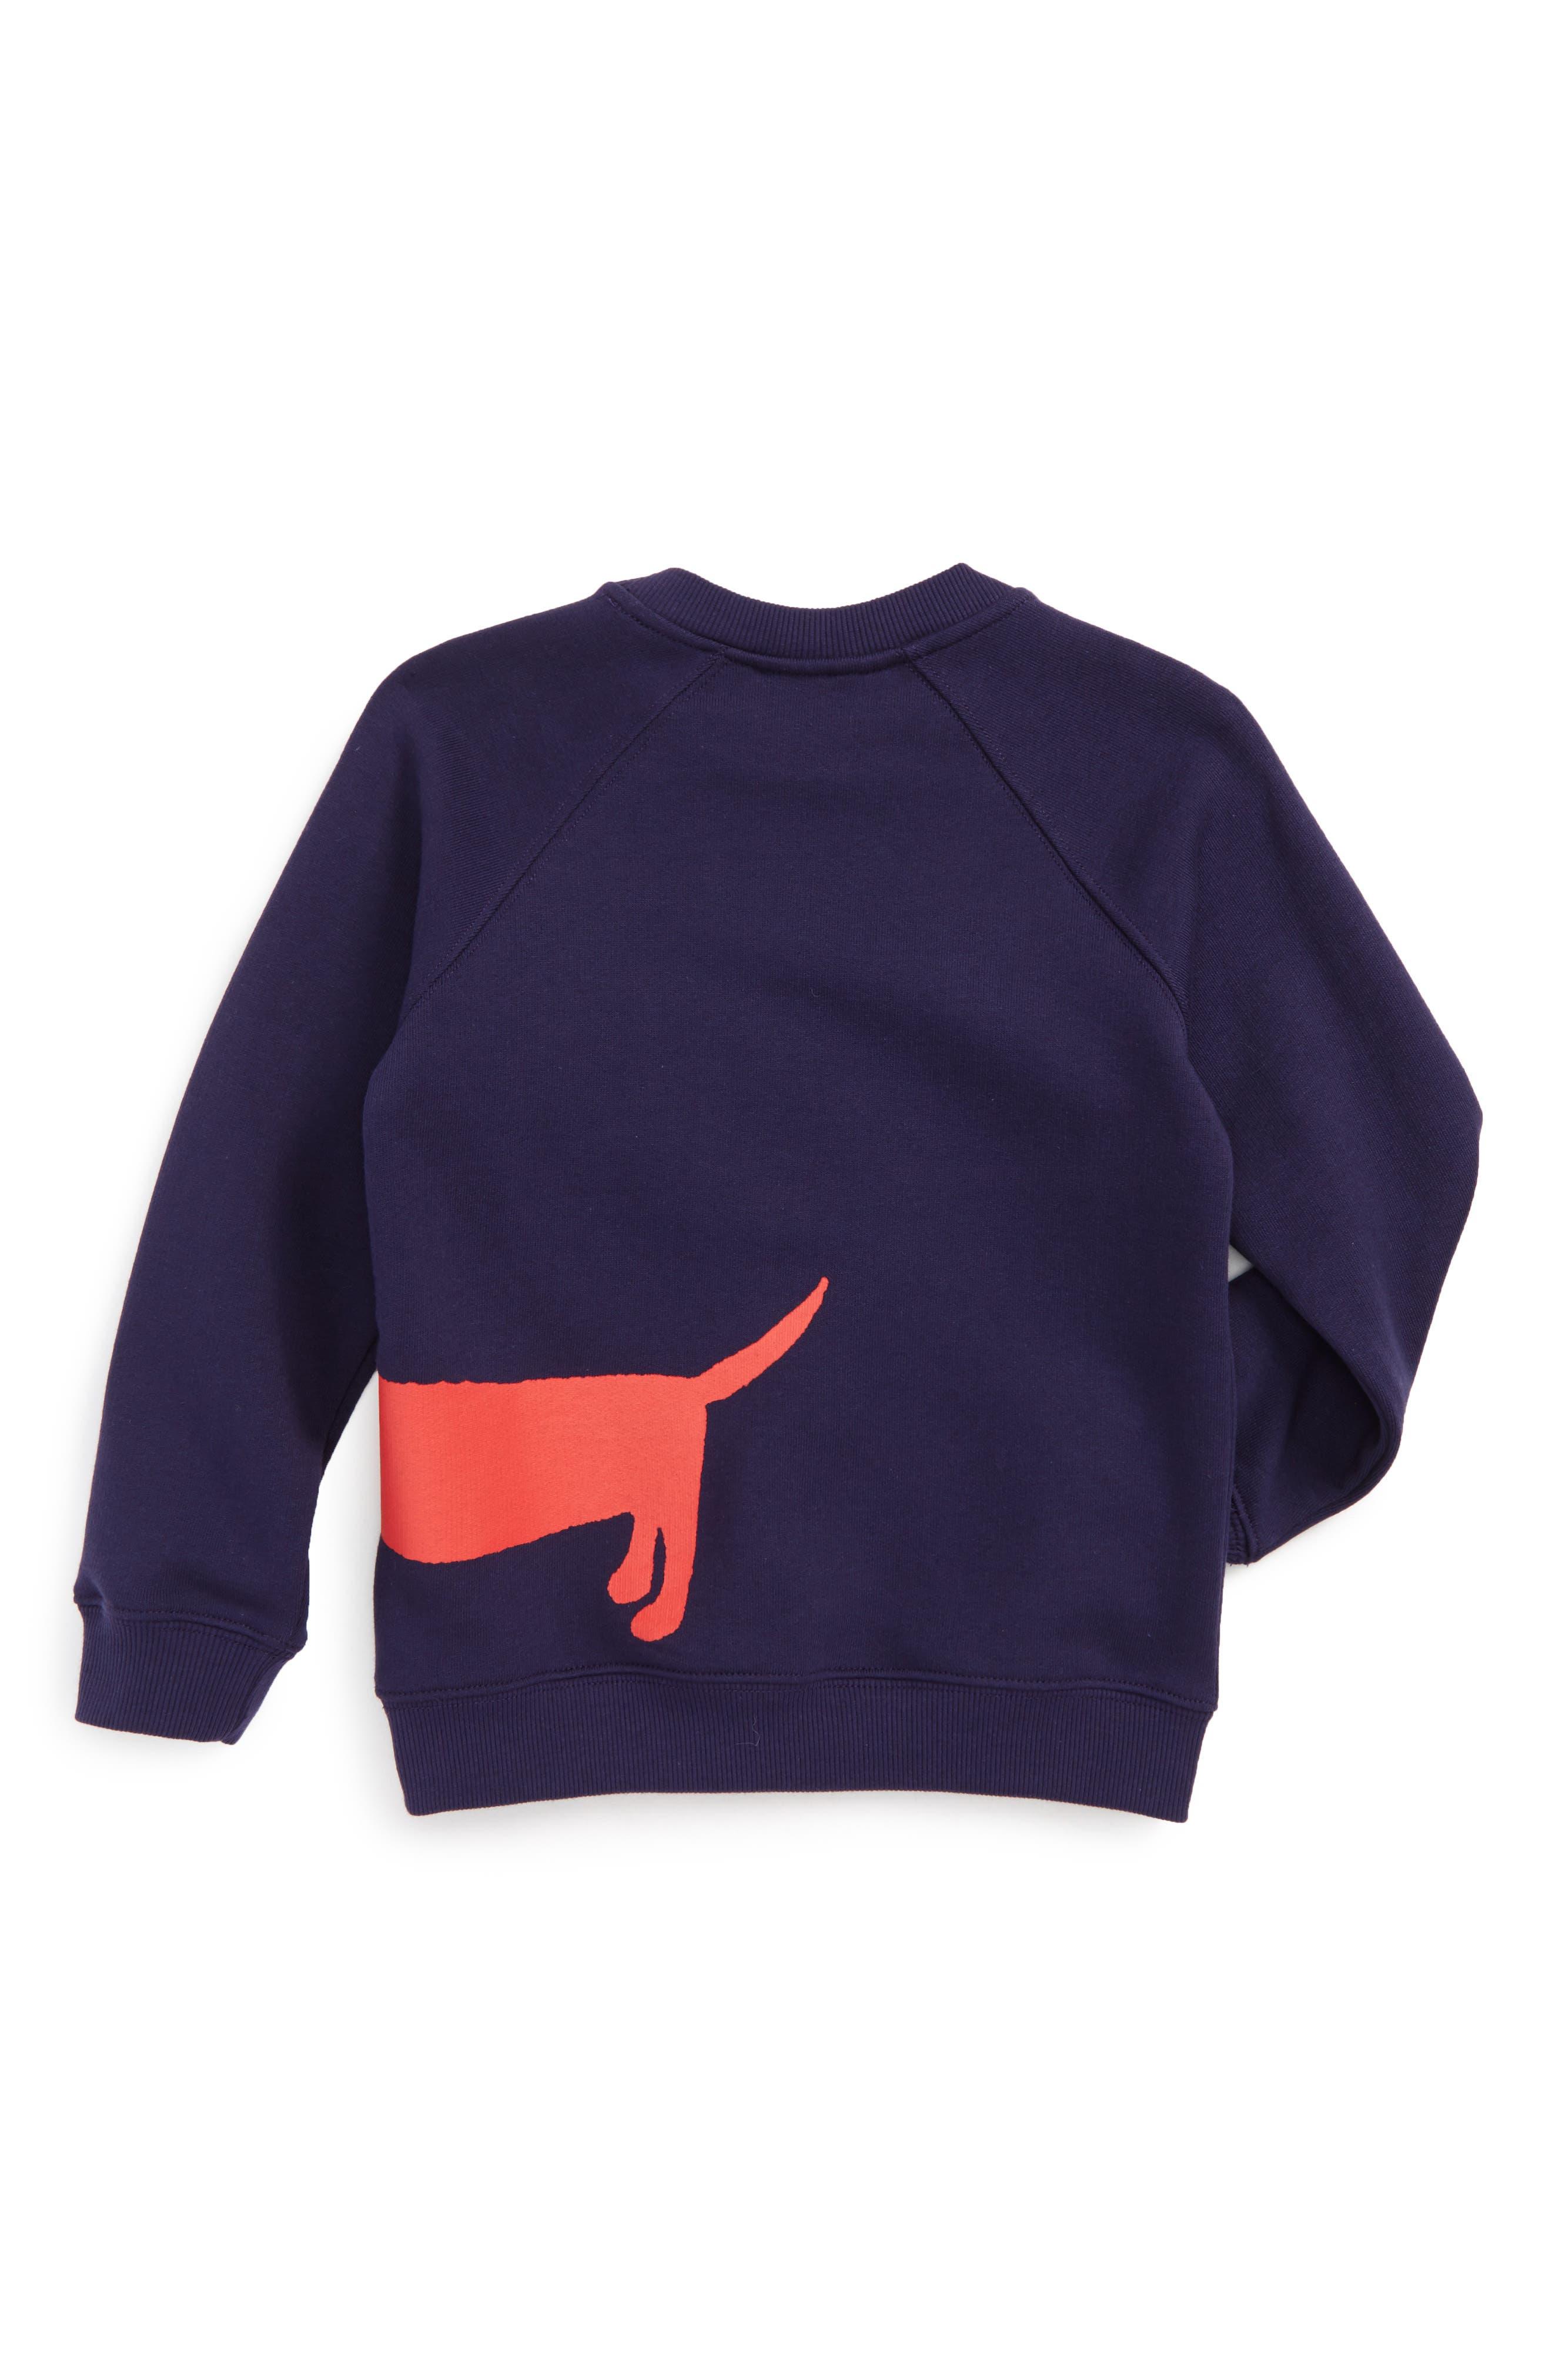 Dog Sweatshirt,                             Alternate thumbnail 2, color,                             410